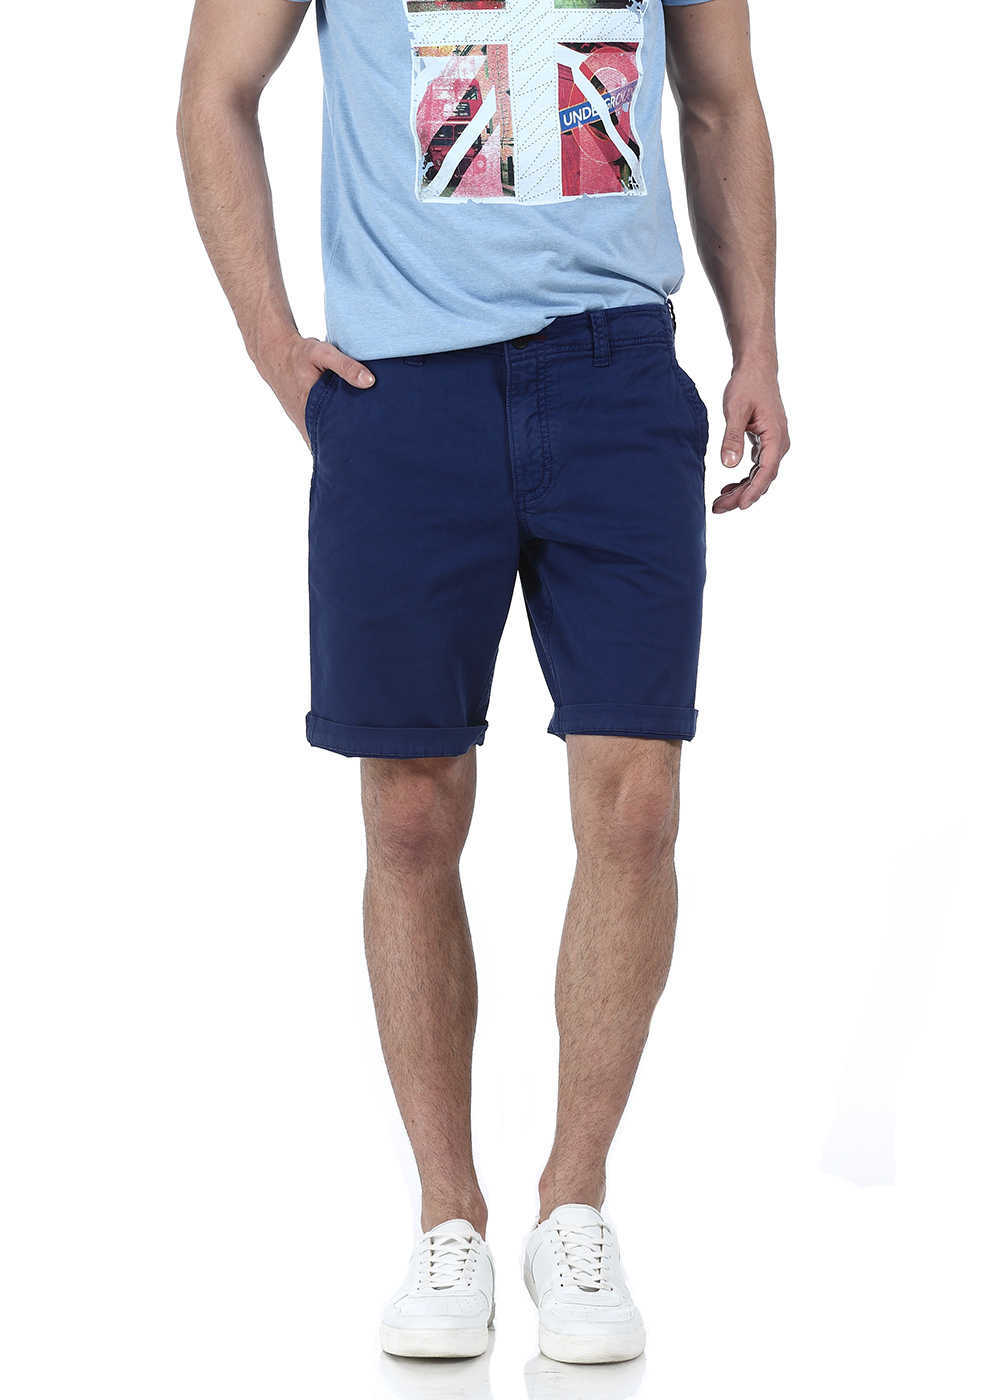 Basics   Basics Comfort Fit Blue Garment Dyed Knee Length Shorts